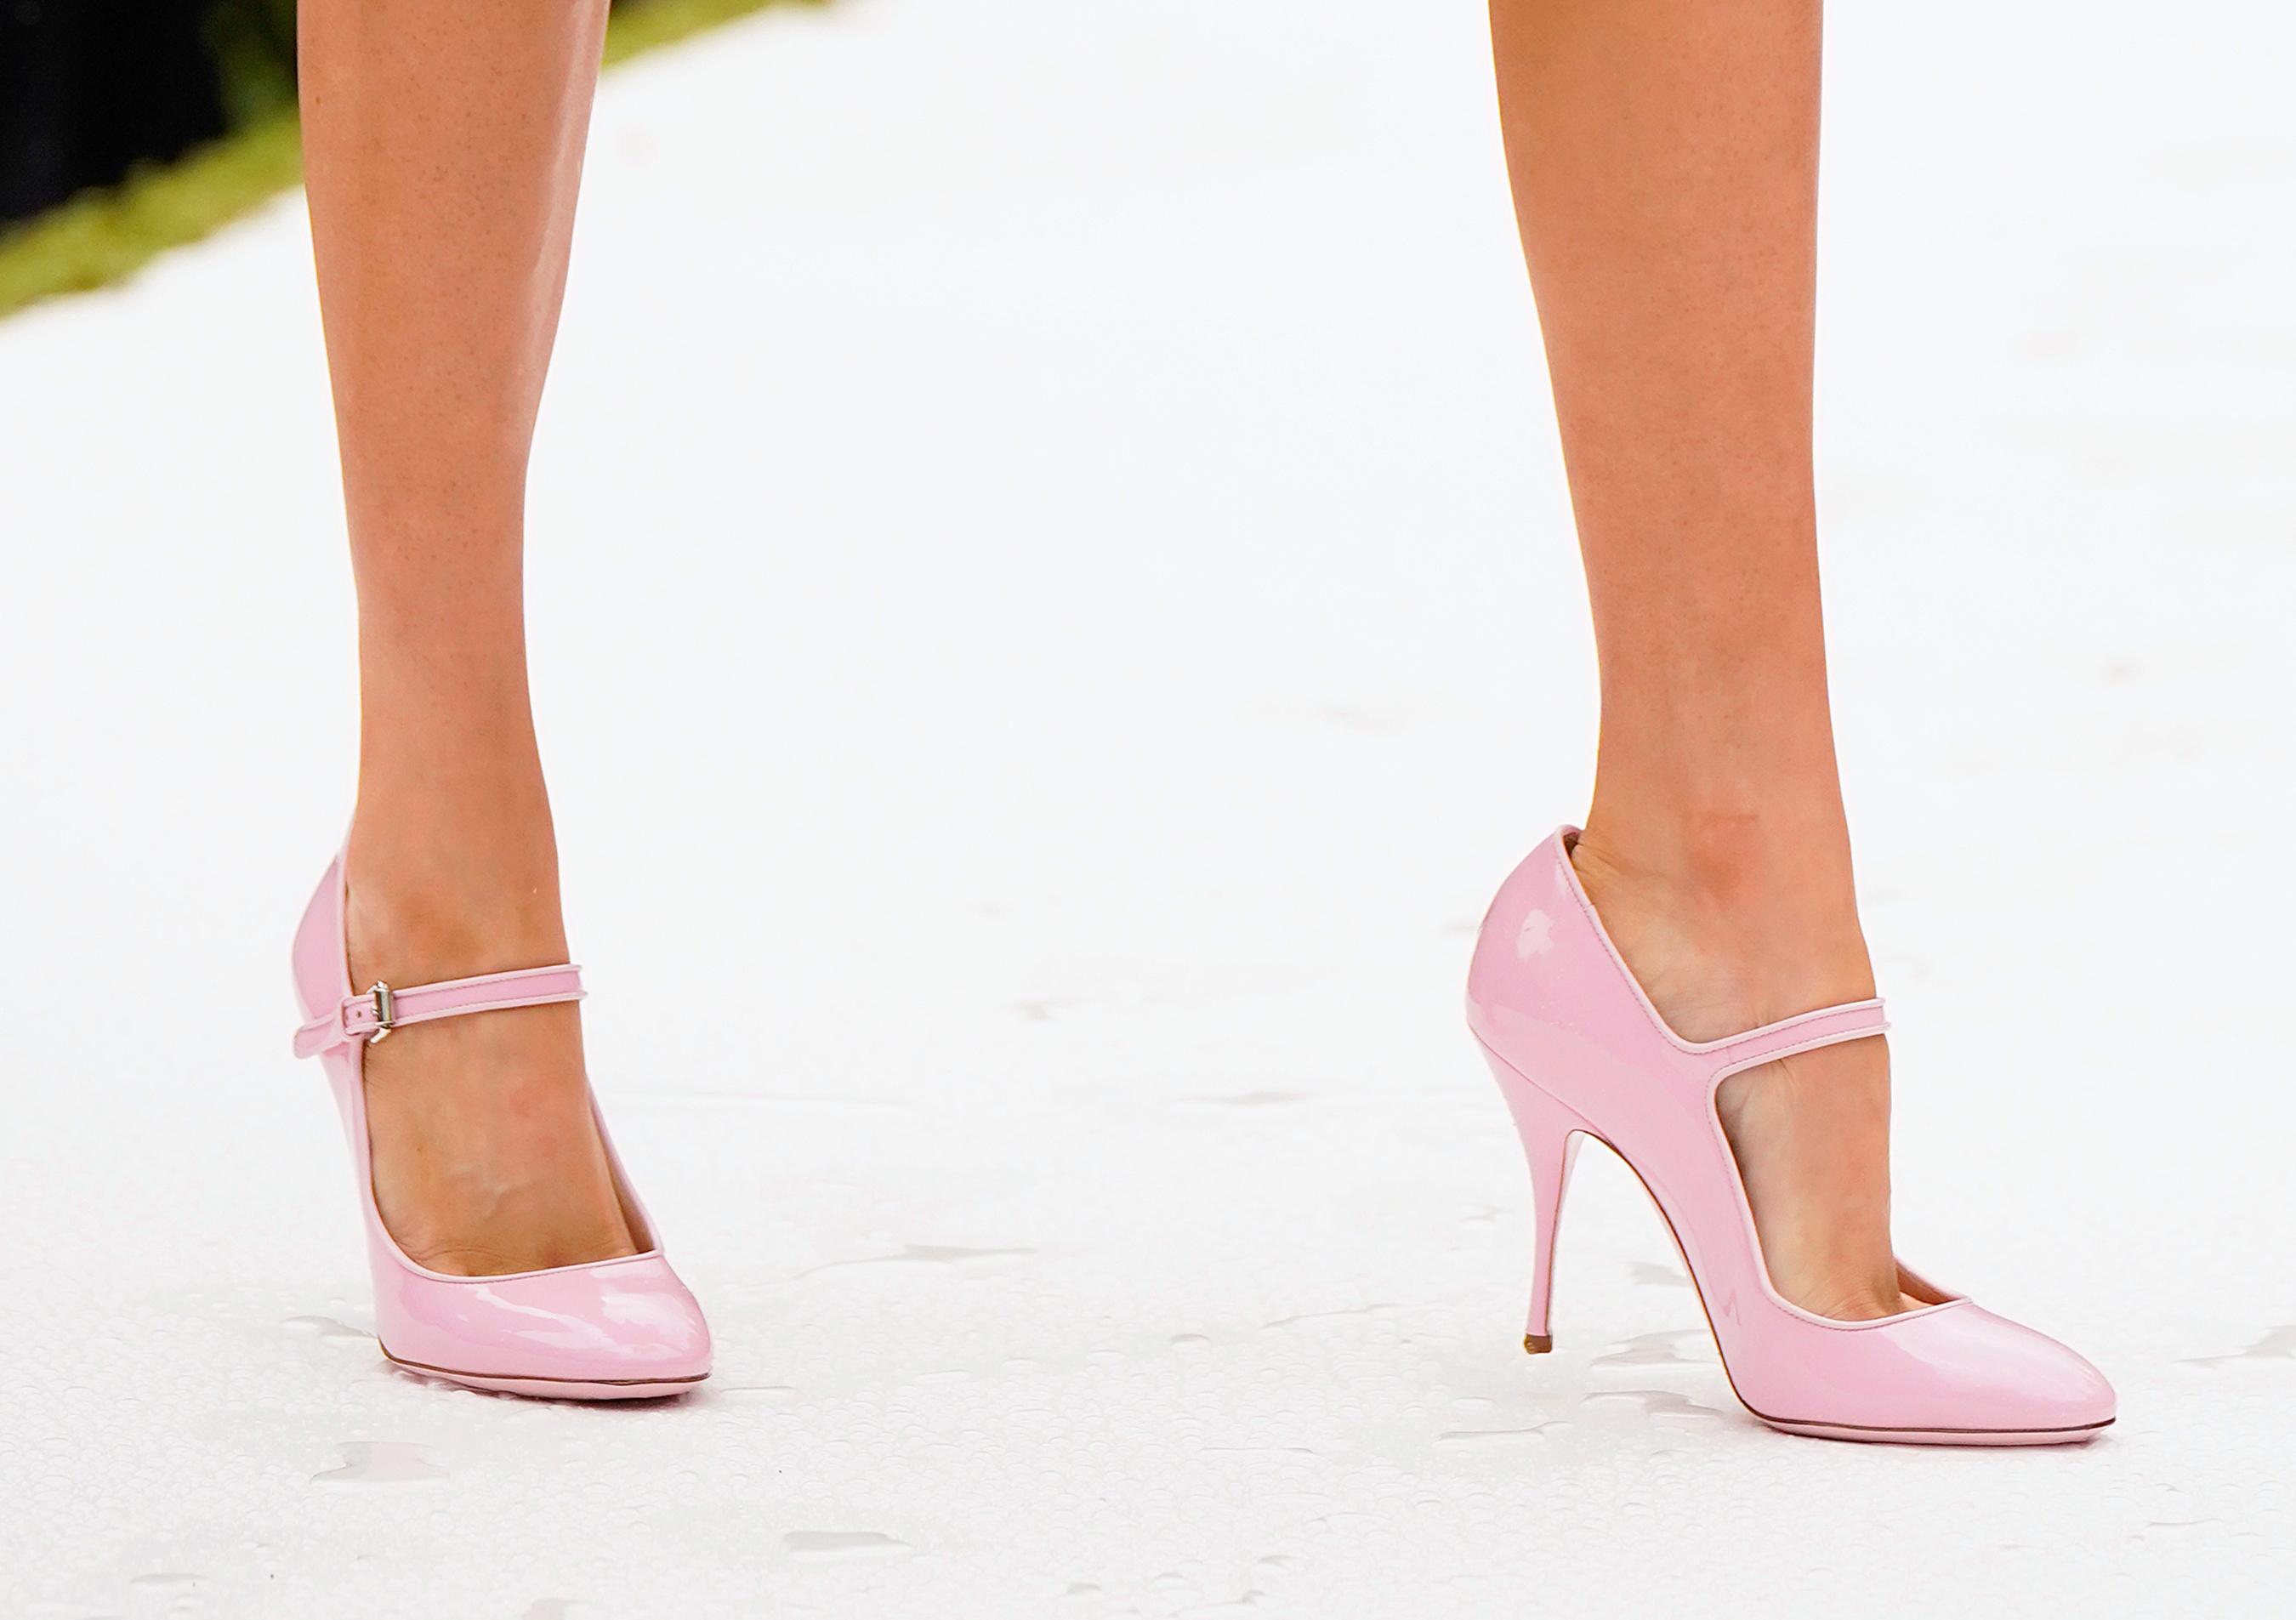 Moschino Spring 2022 Details Fashion Show